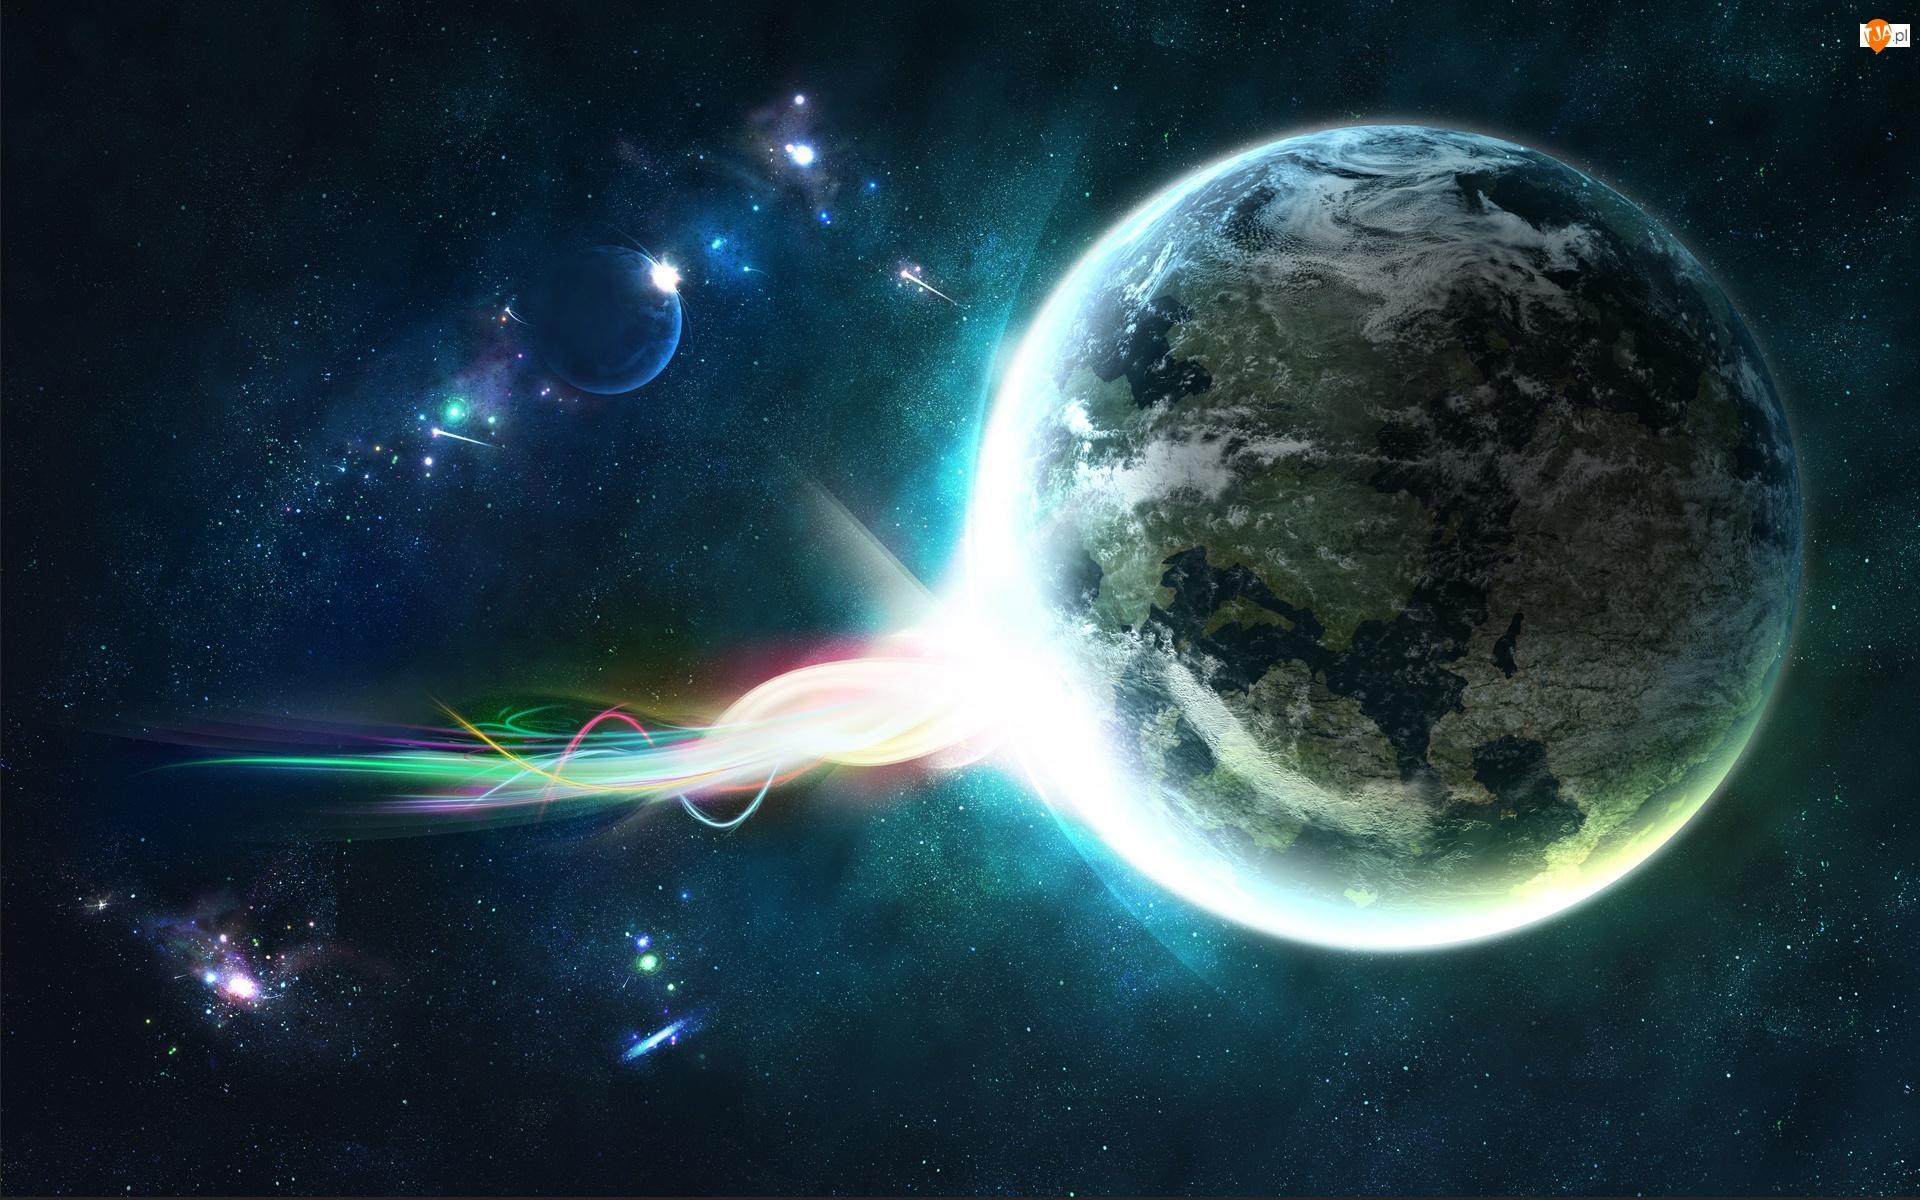 Kometa, Ziemia, Kosmos